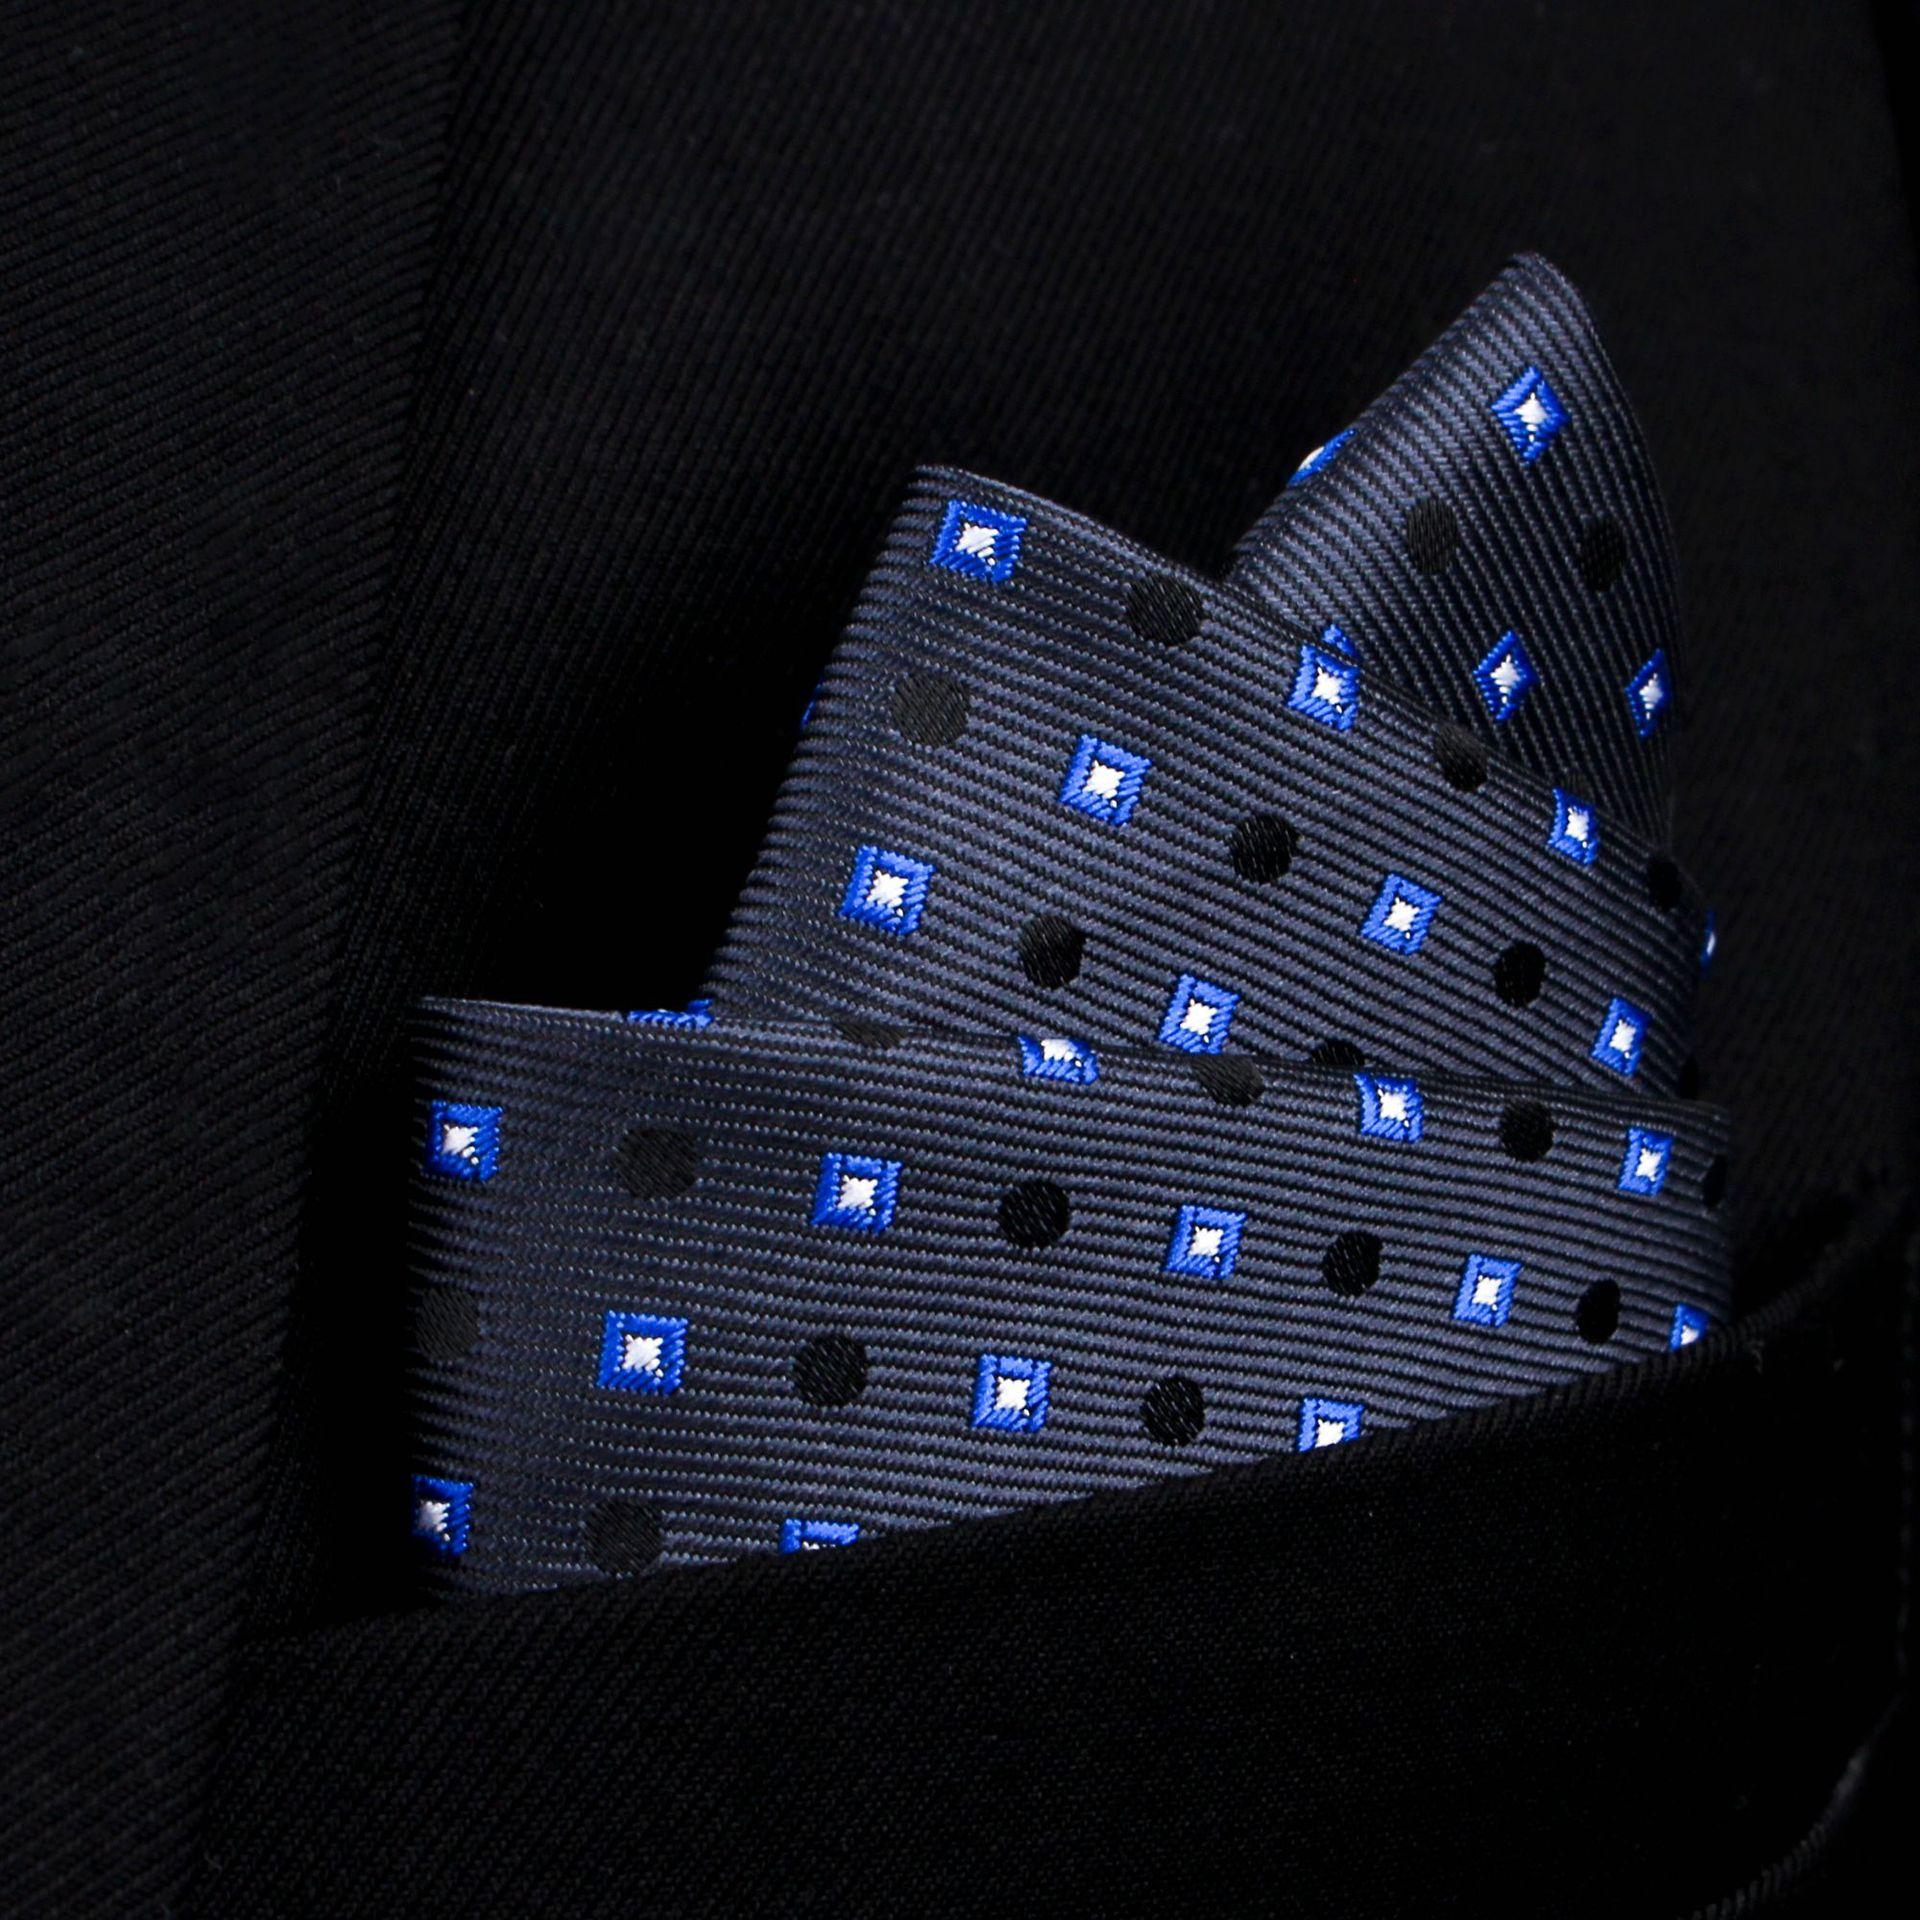 Bridegroom Wedding Business Men Tuxedo Suit Imitated Silk Navy Blue Polka Dot Plaid Embroidery Pocket Square Towel Handkerchief